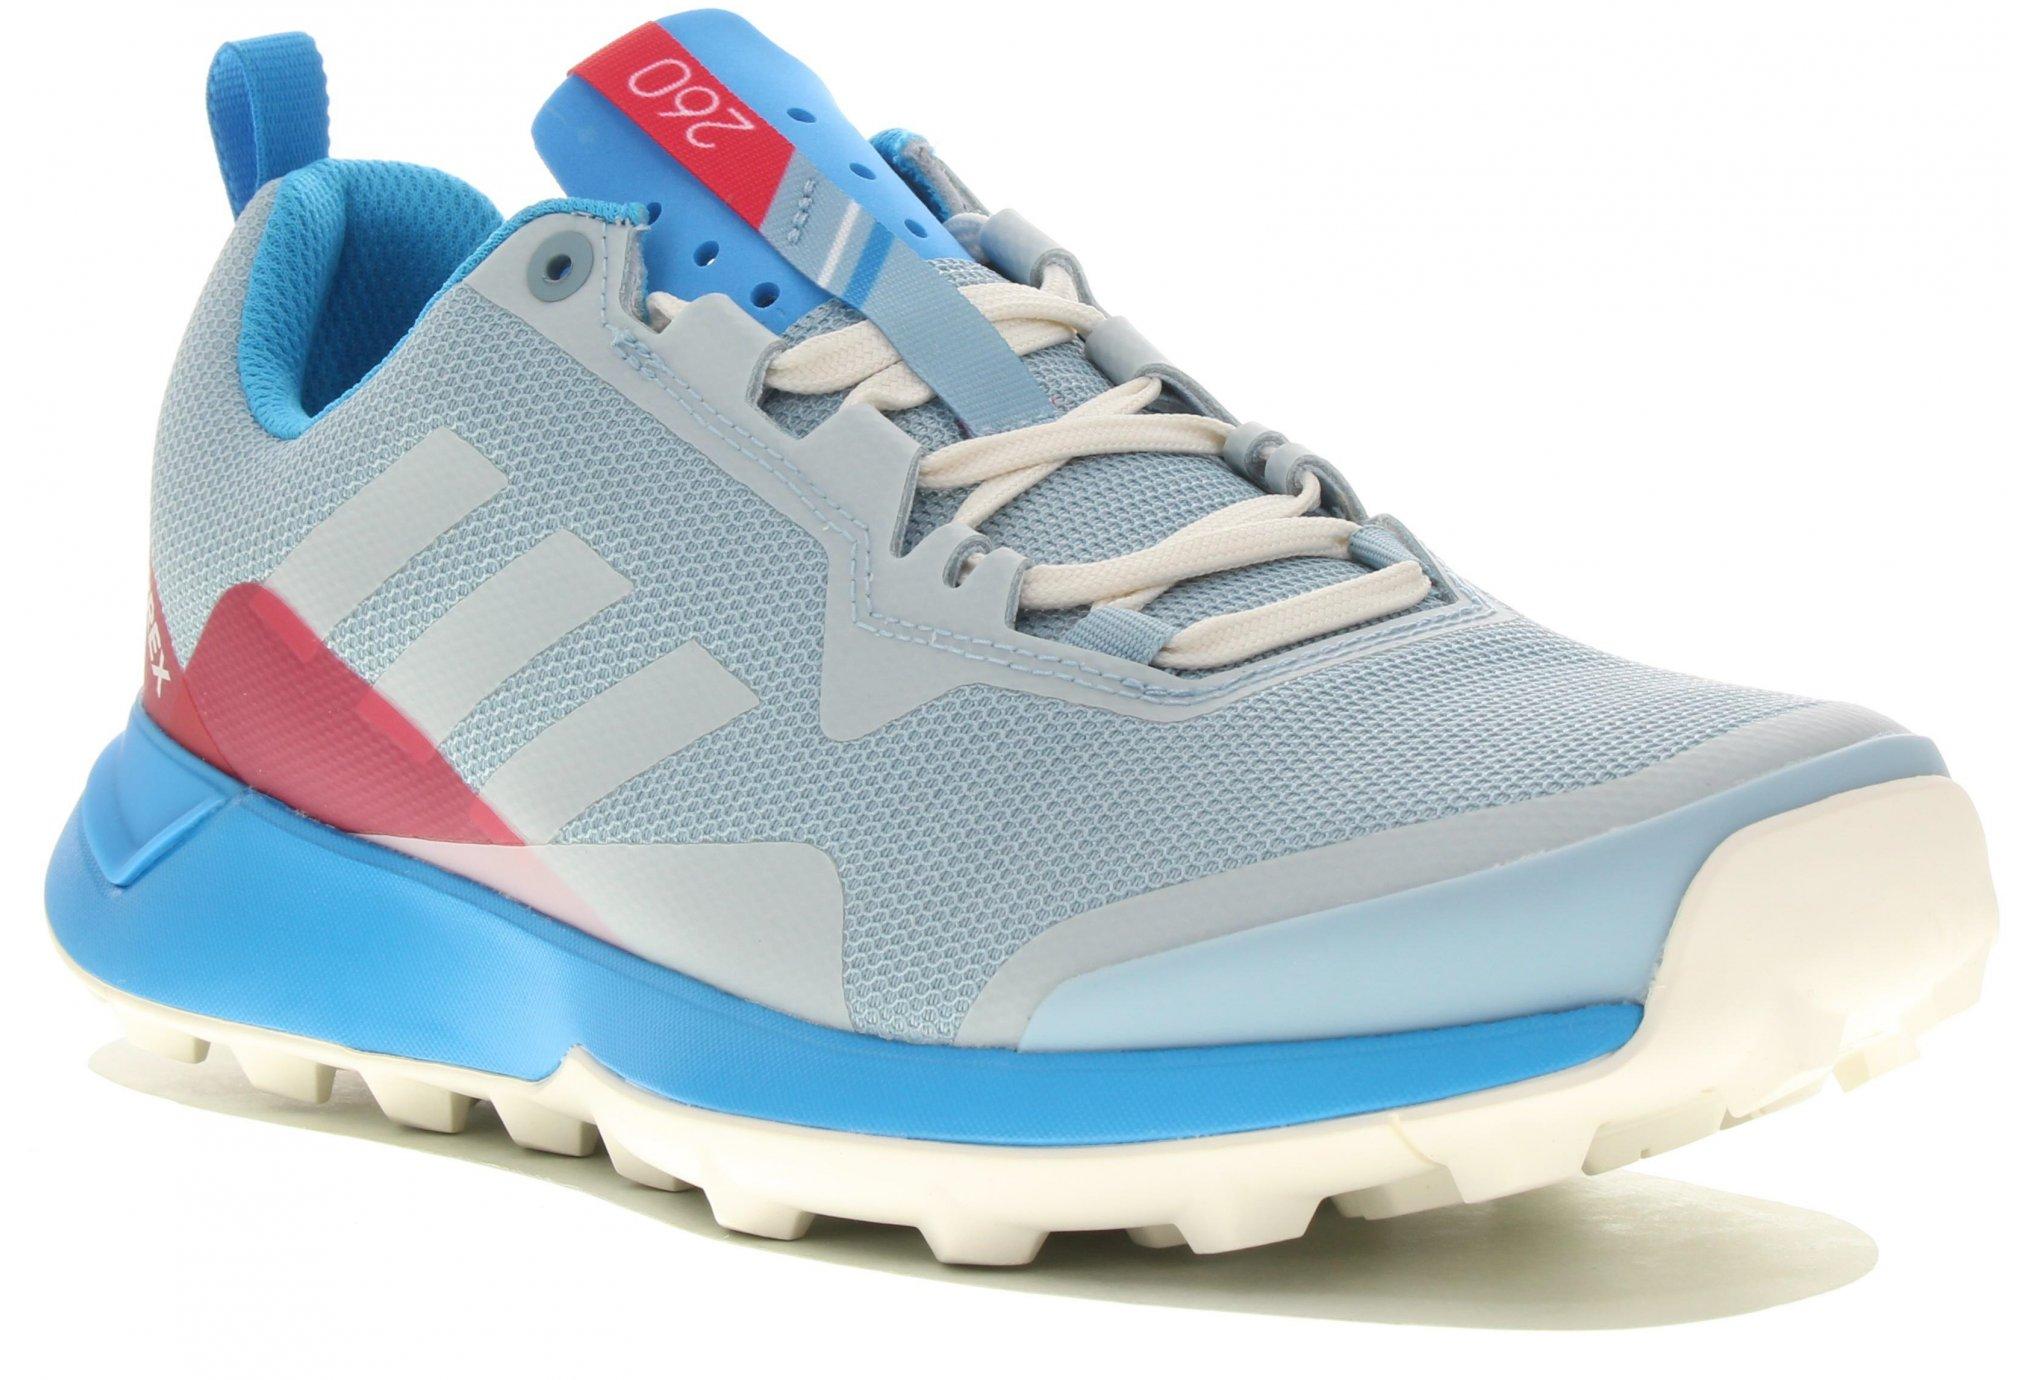 Adidas Terrex cmtk w chaussures running femme